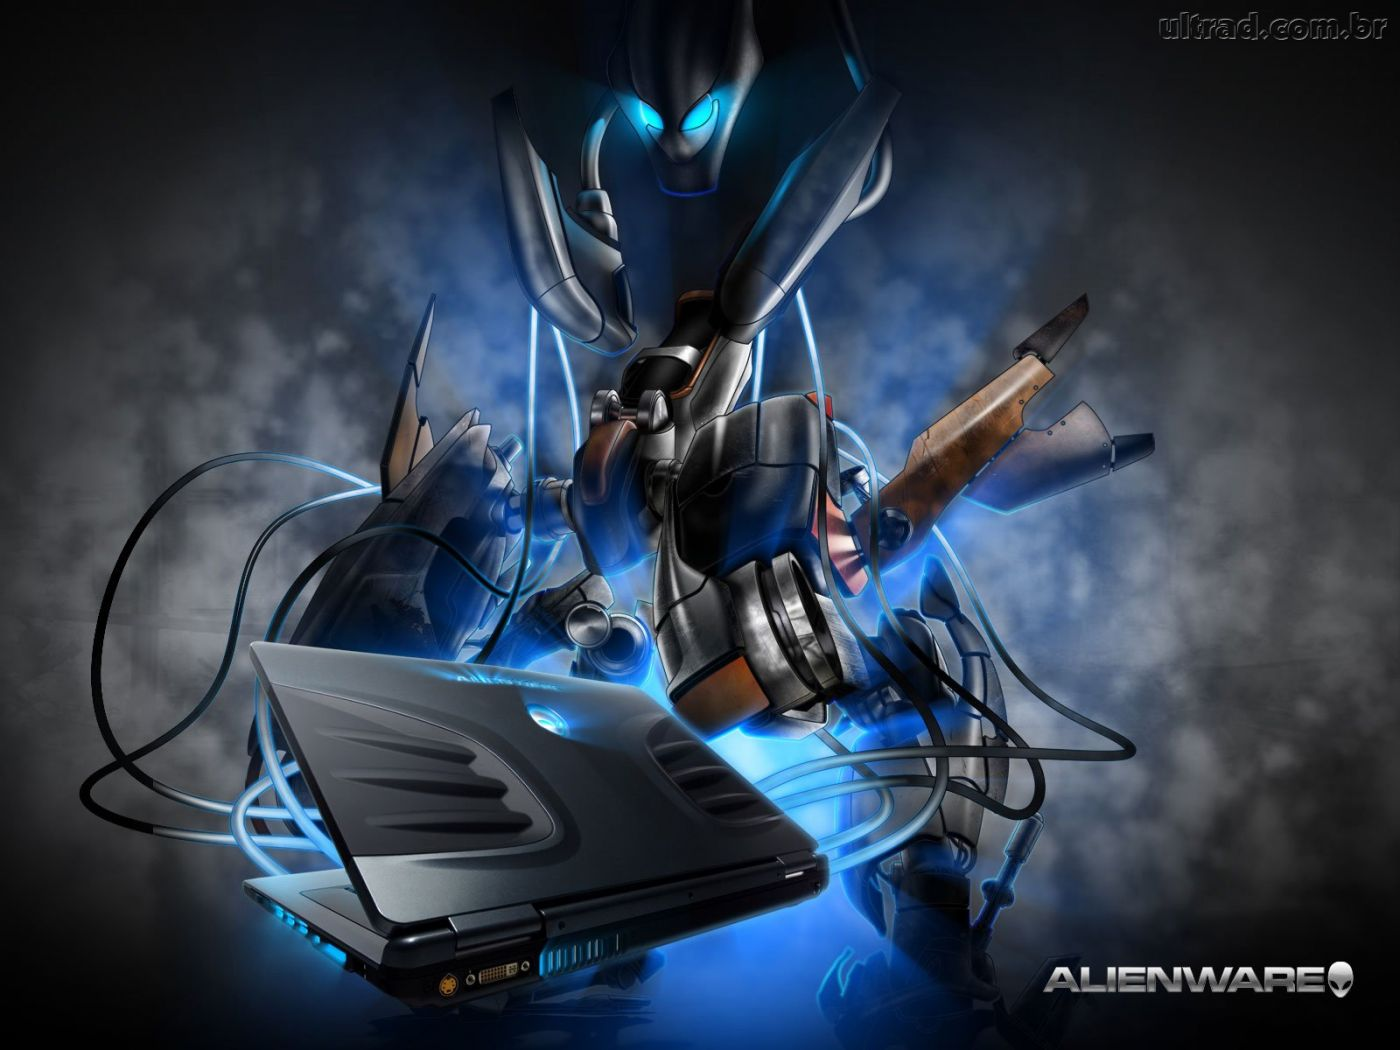 http://1.bp.blogspot.com/-3VB9y7eMmrw/UAHMKbblZkI/AAAAAAAAAUI/OreX9HZJkCY/s1600/72175_Papel-de-Parede-Alienware--72175_1400x1050.jpg